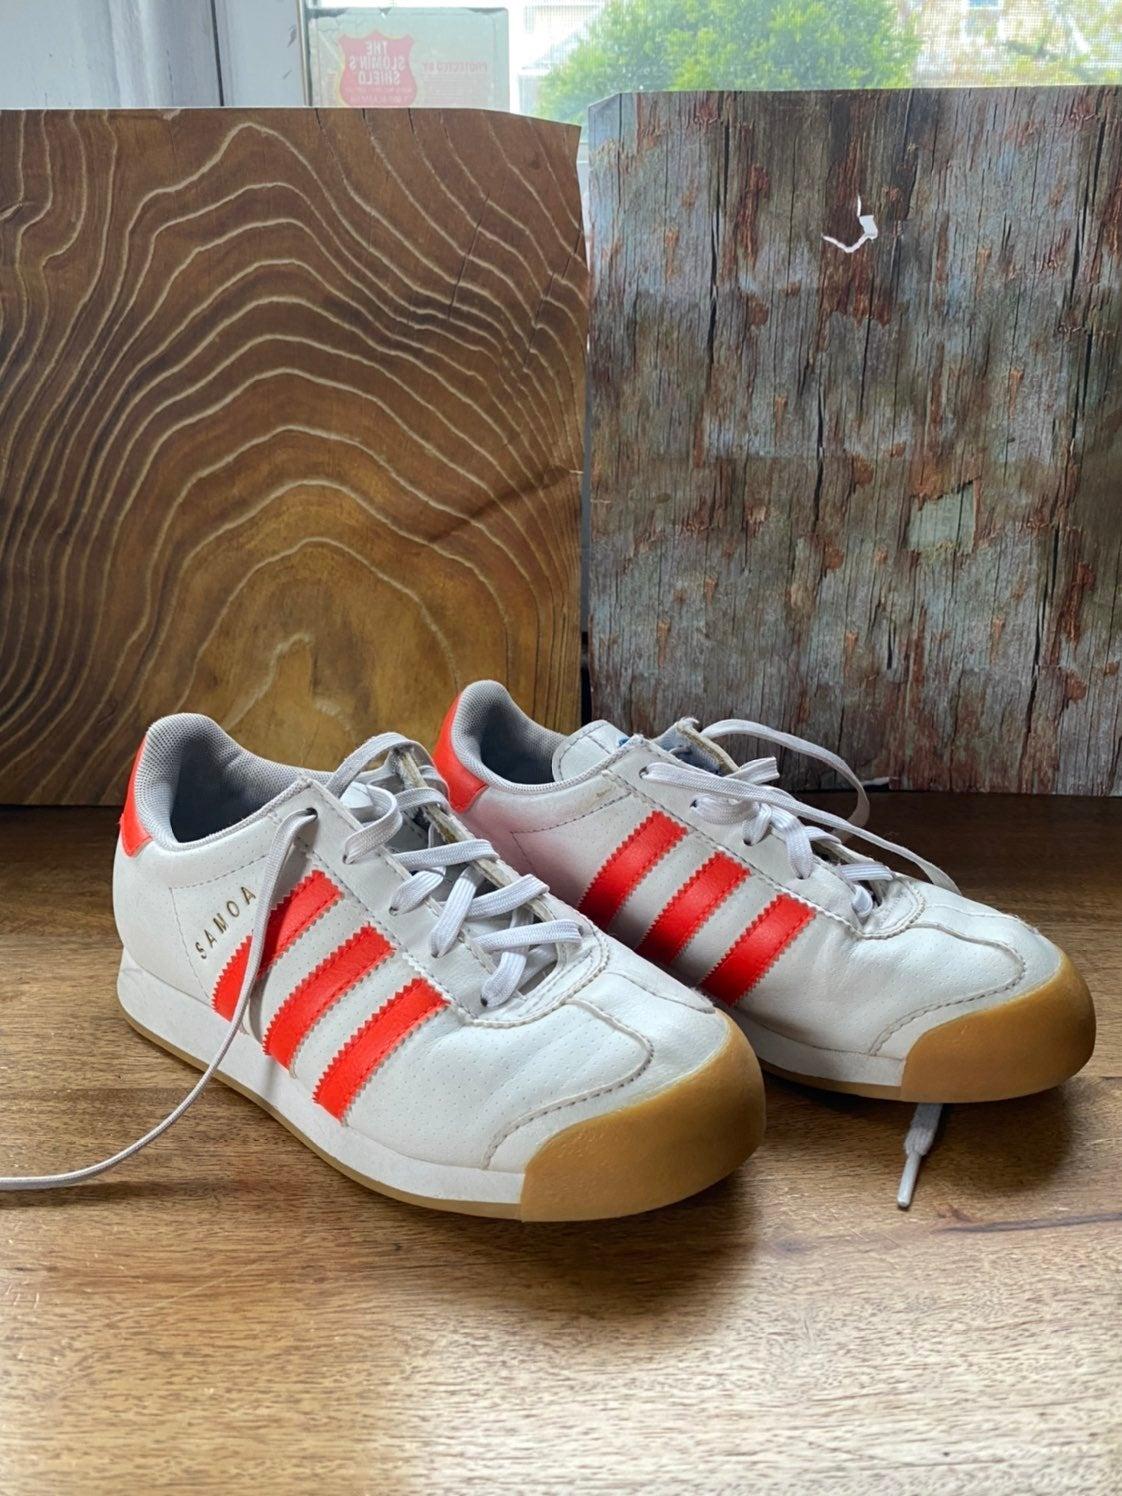 Boys Samoa Adidas Sneakers 1.5